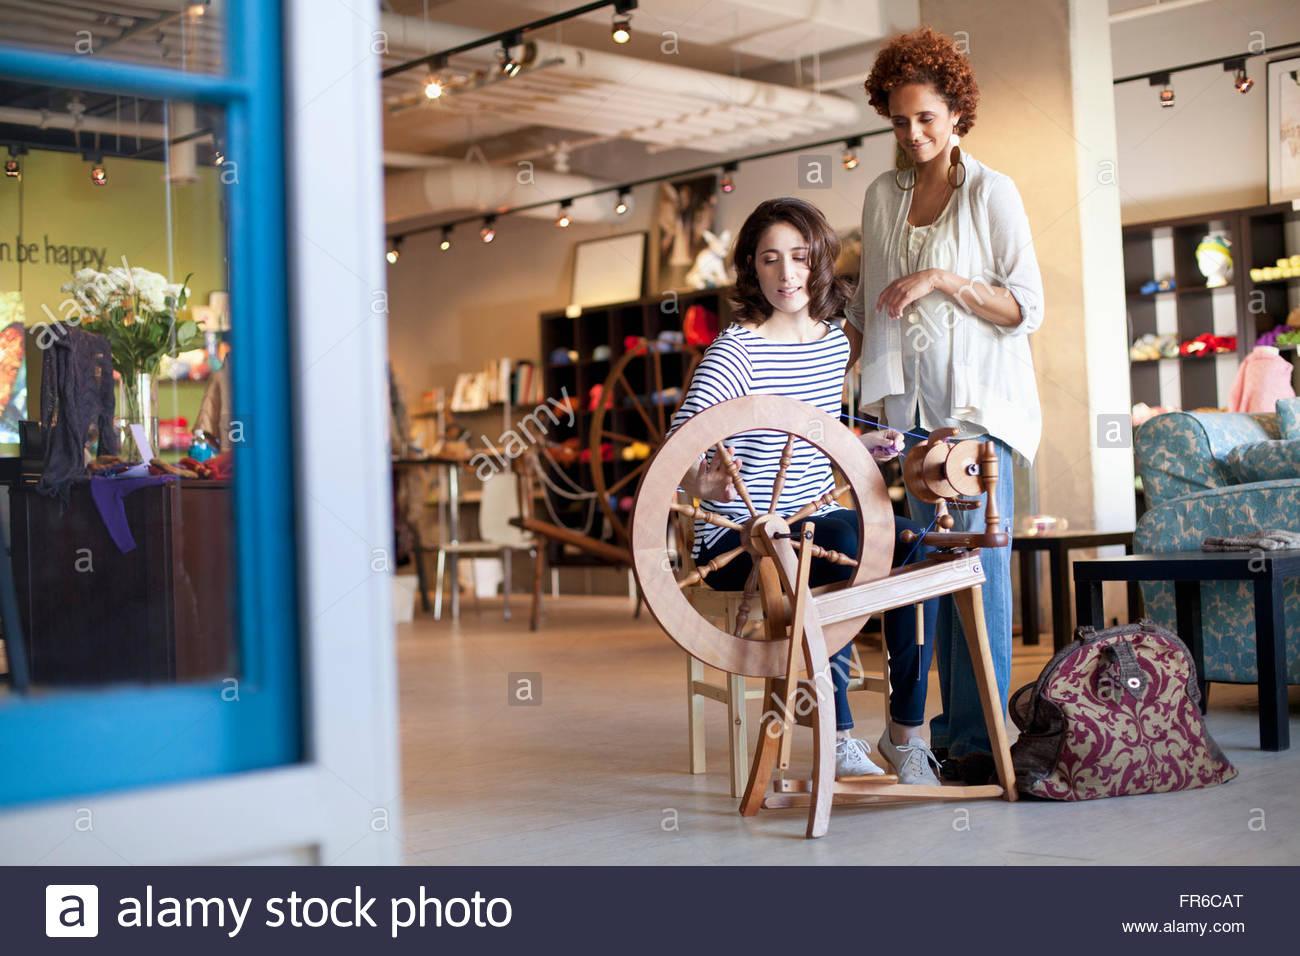 demonstration at yarn store - Stock Image